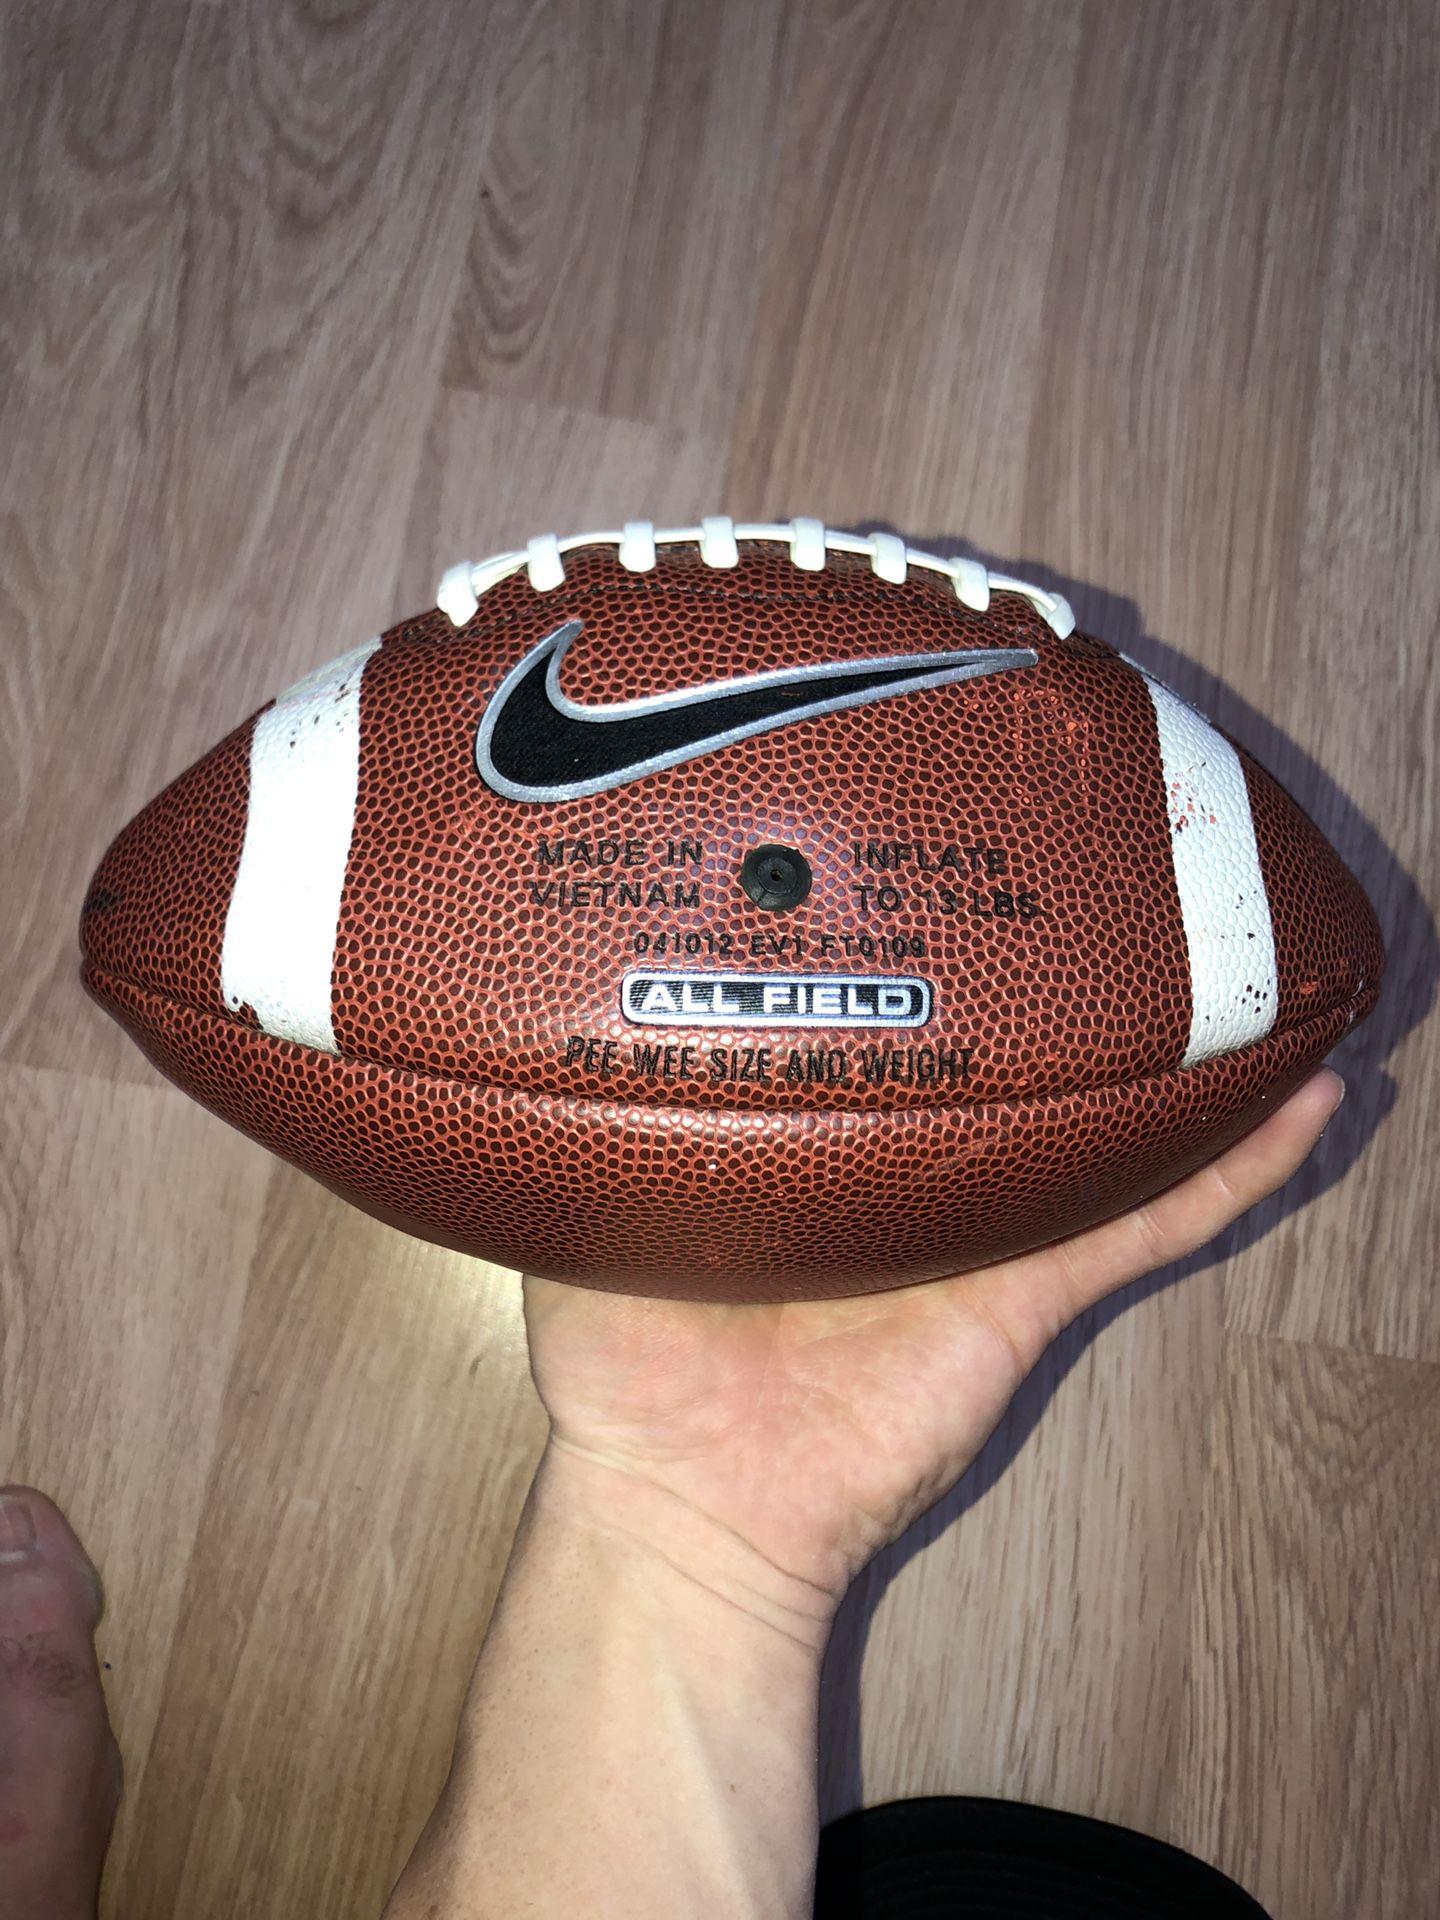 Youth sized kid football